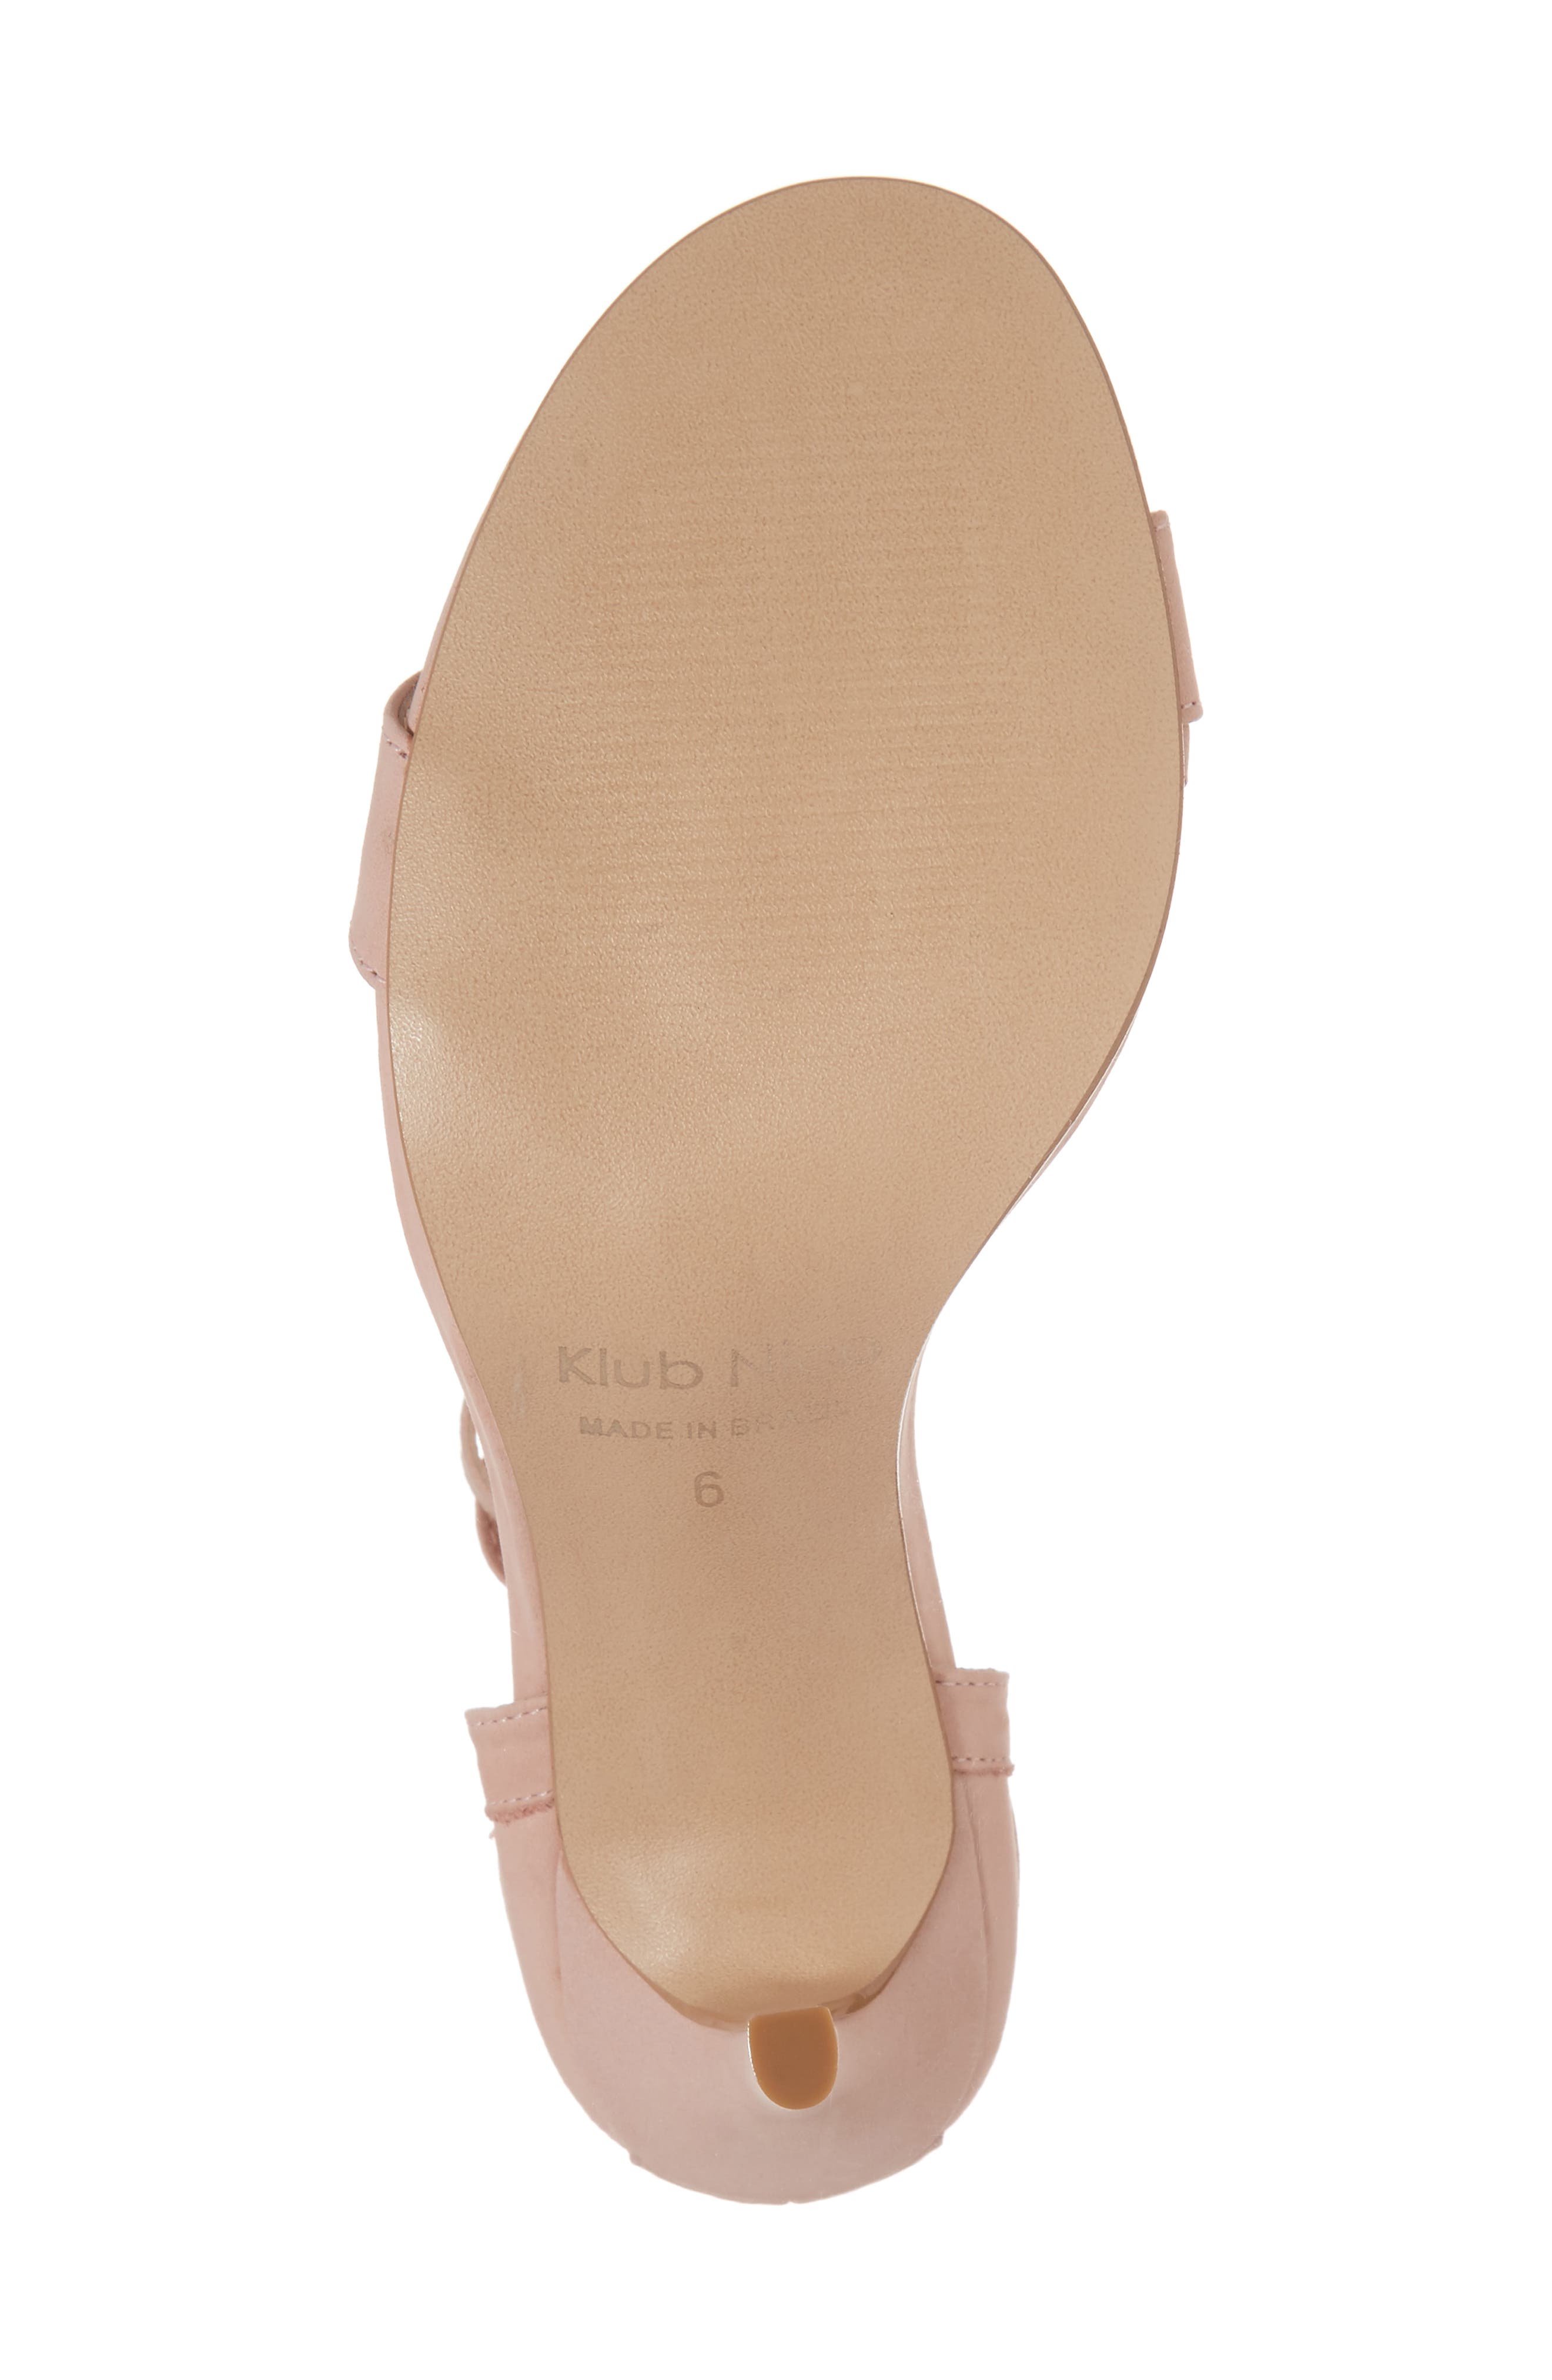 Adelyn Bow Tie Sandal,                             Alternate thumbnail 6, color,                             Quartz Leather